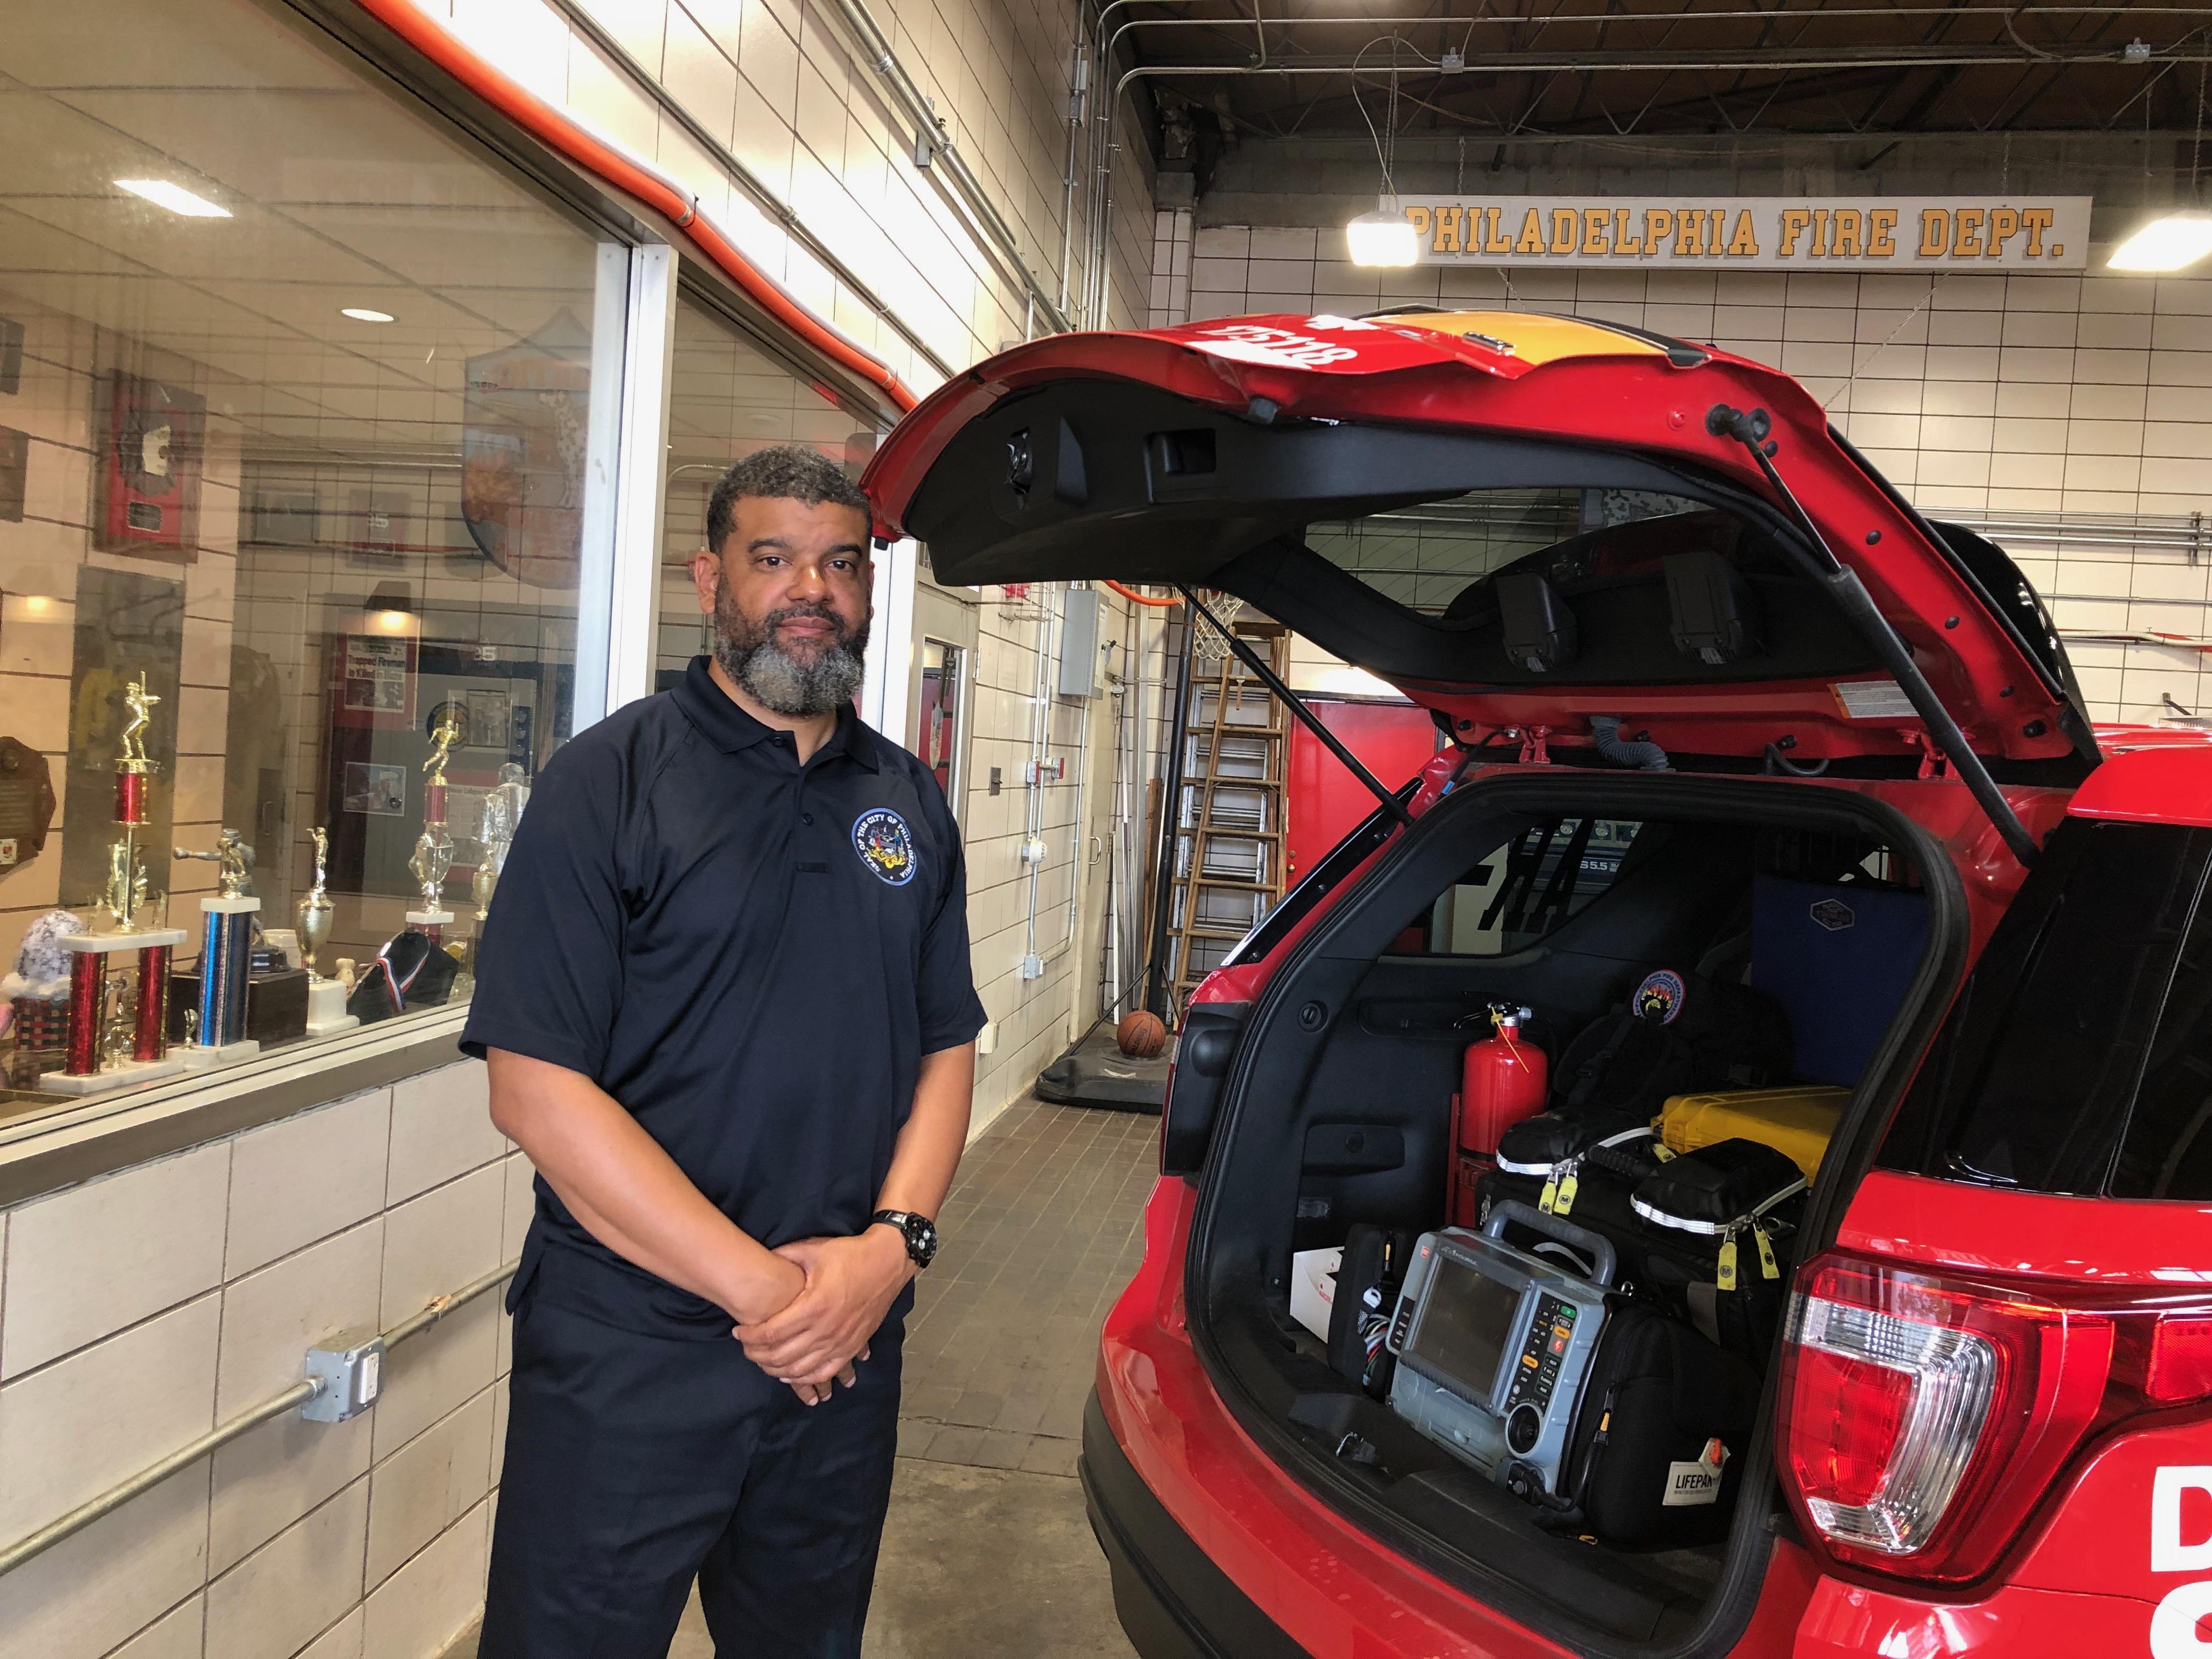 New Philadelphia emergency unit responds to overdoses in Kensington